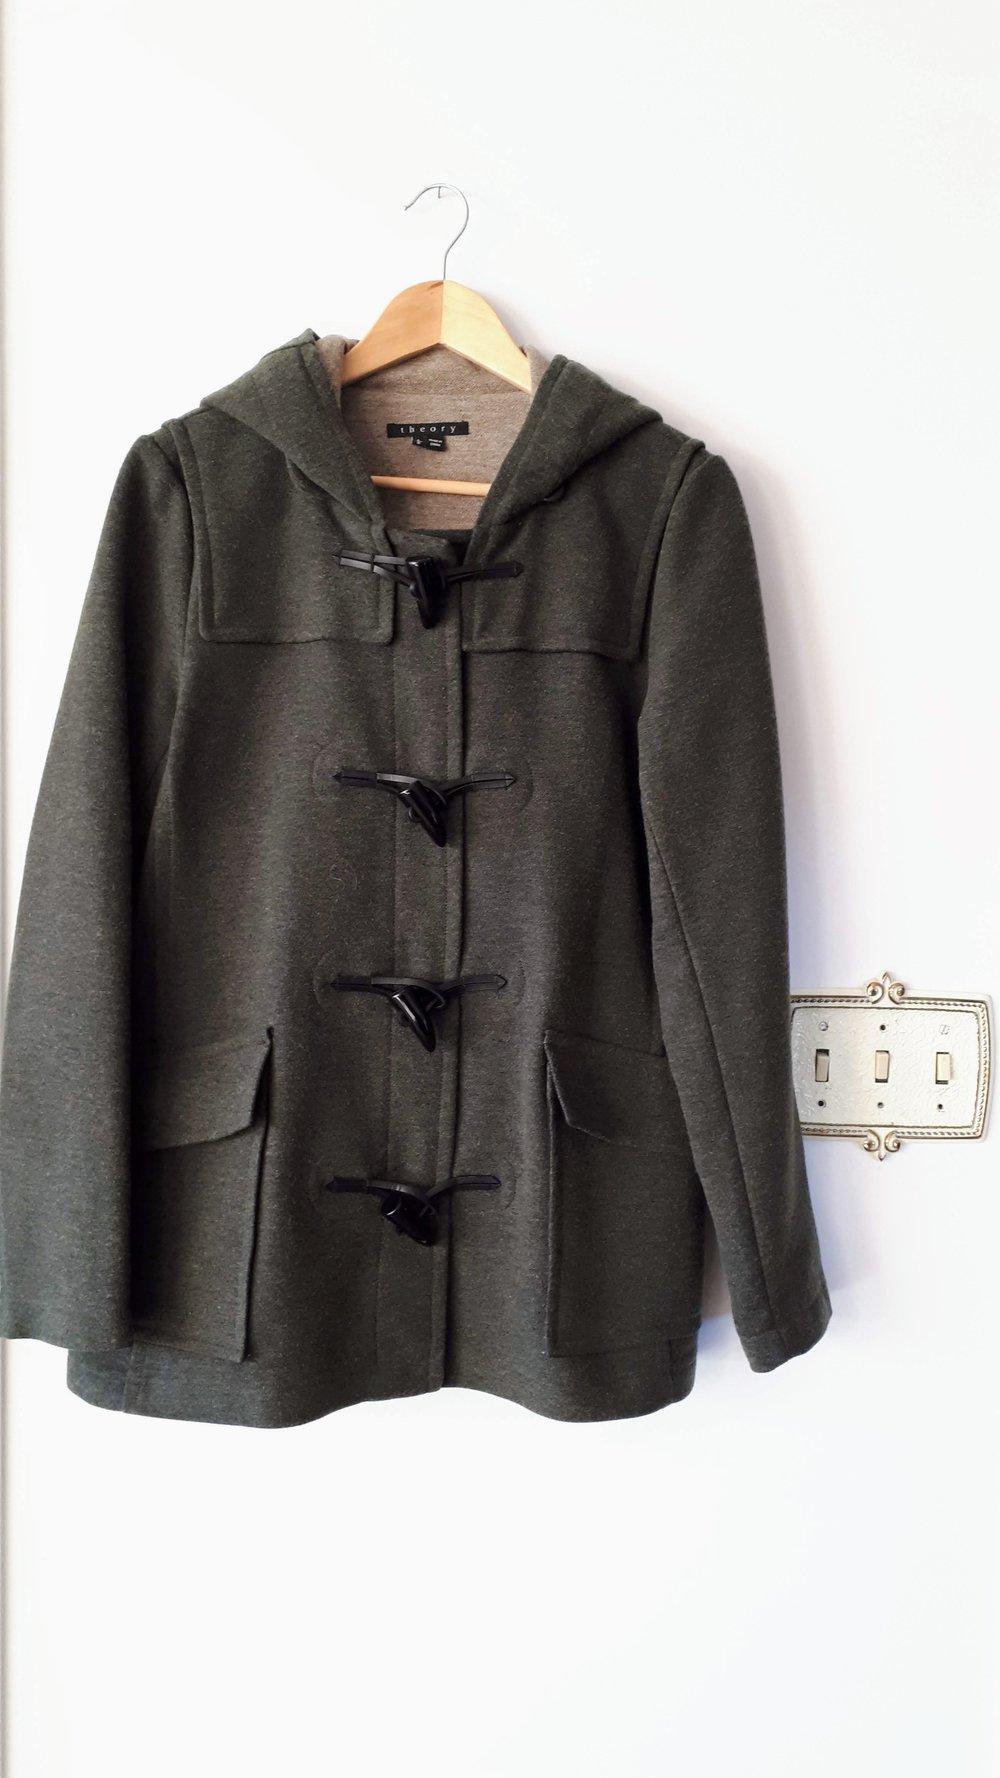 Theory coat; Size L, $95